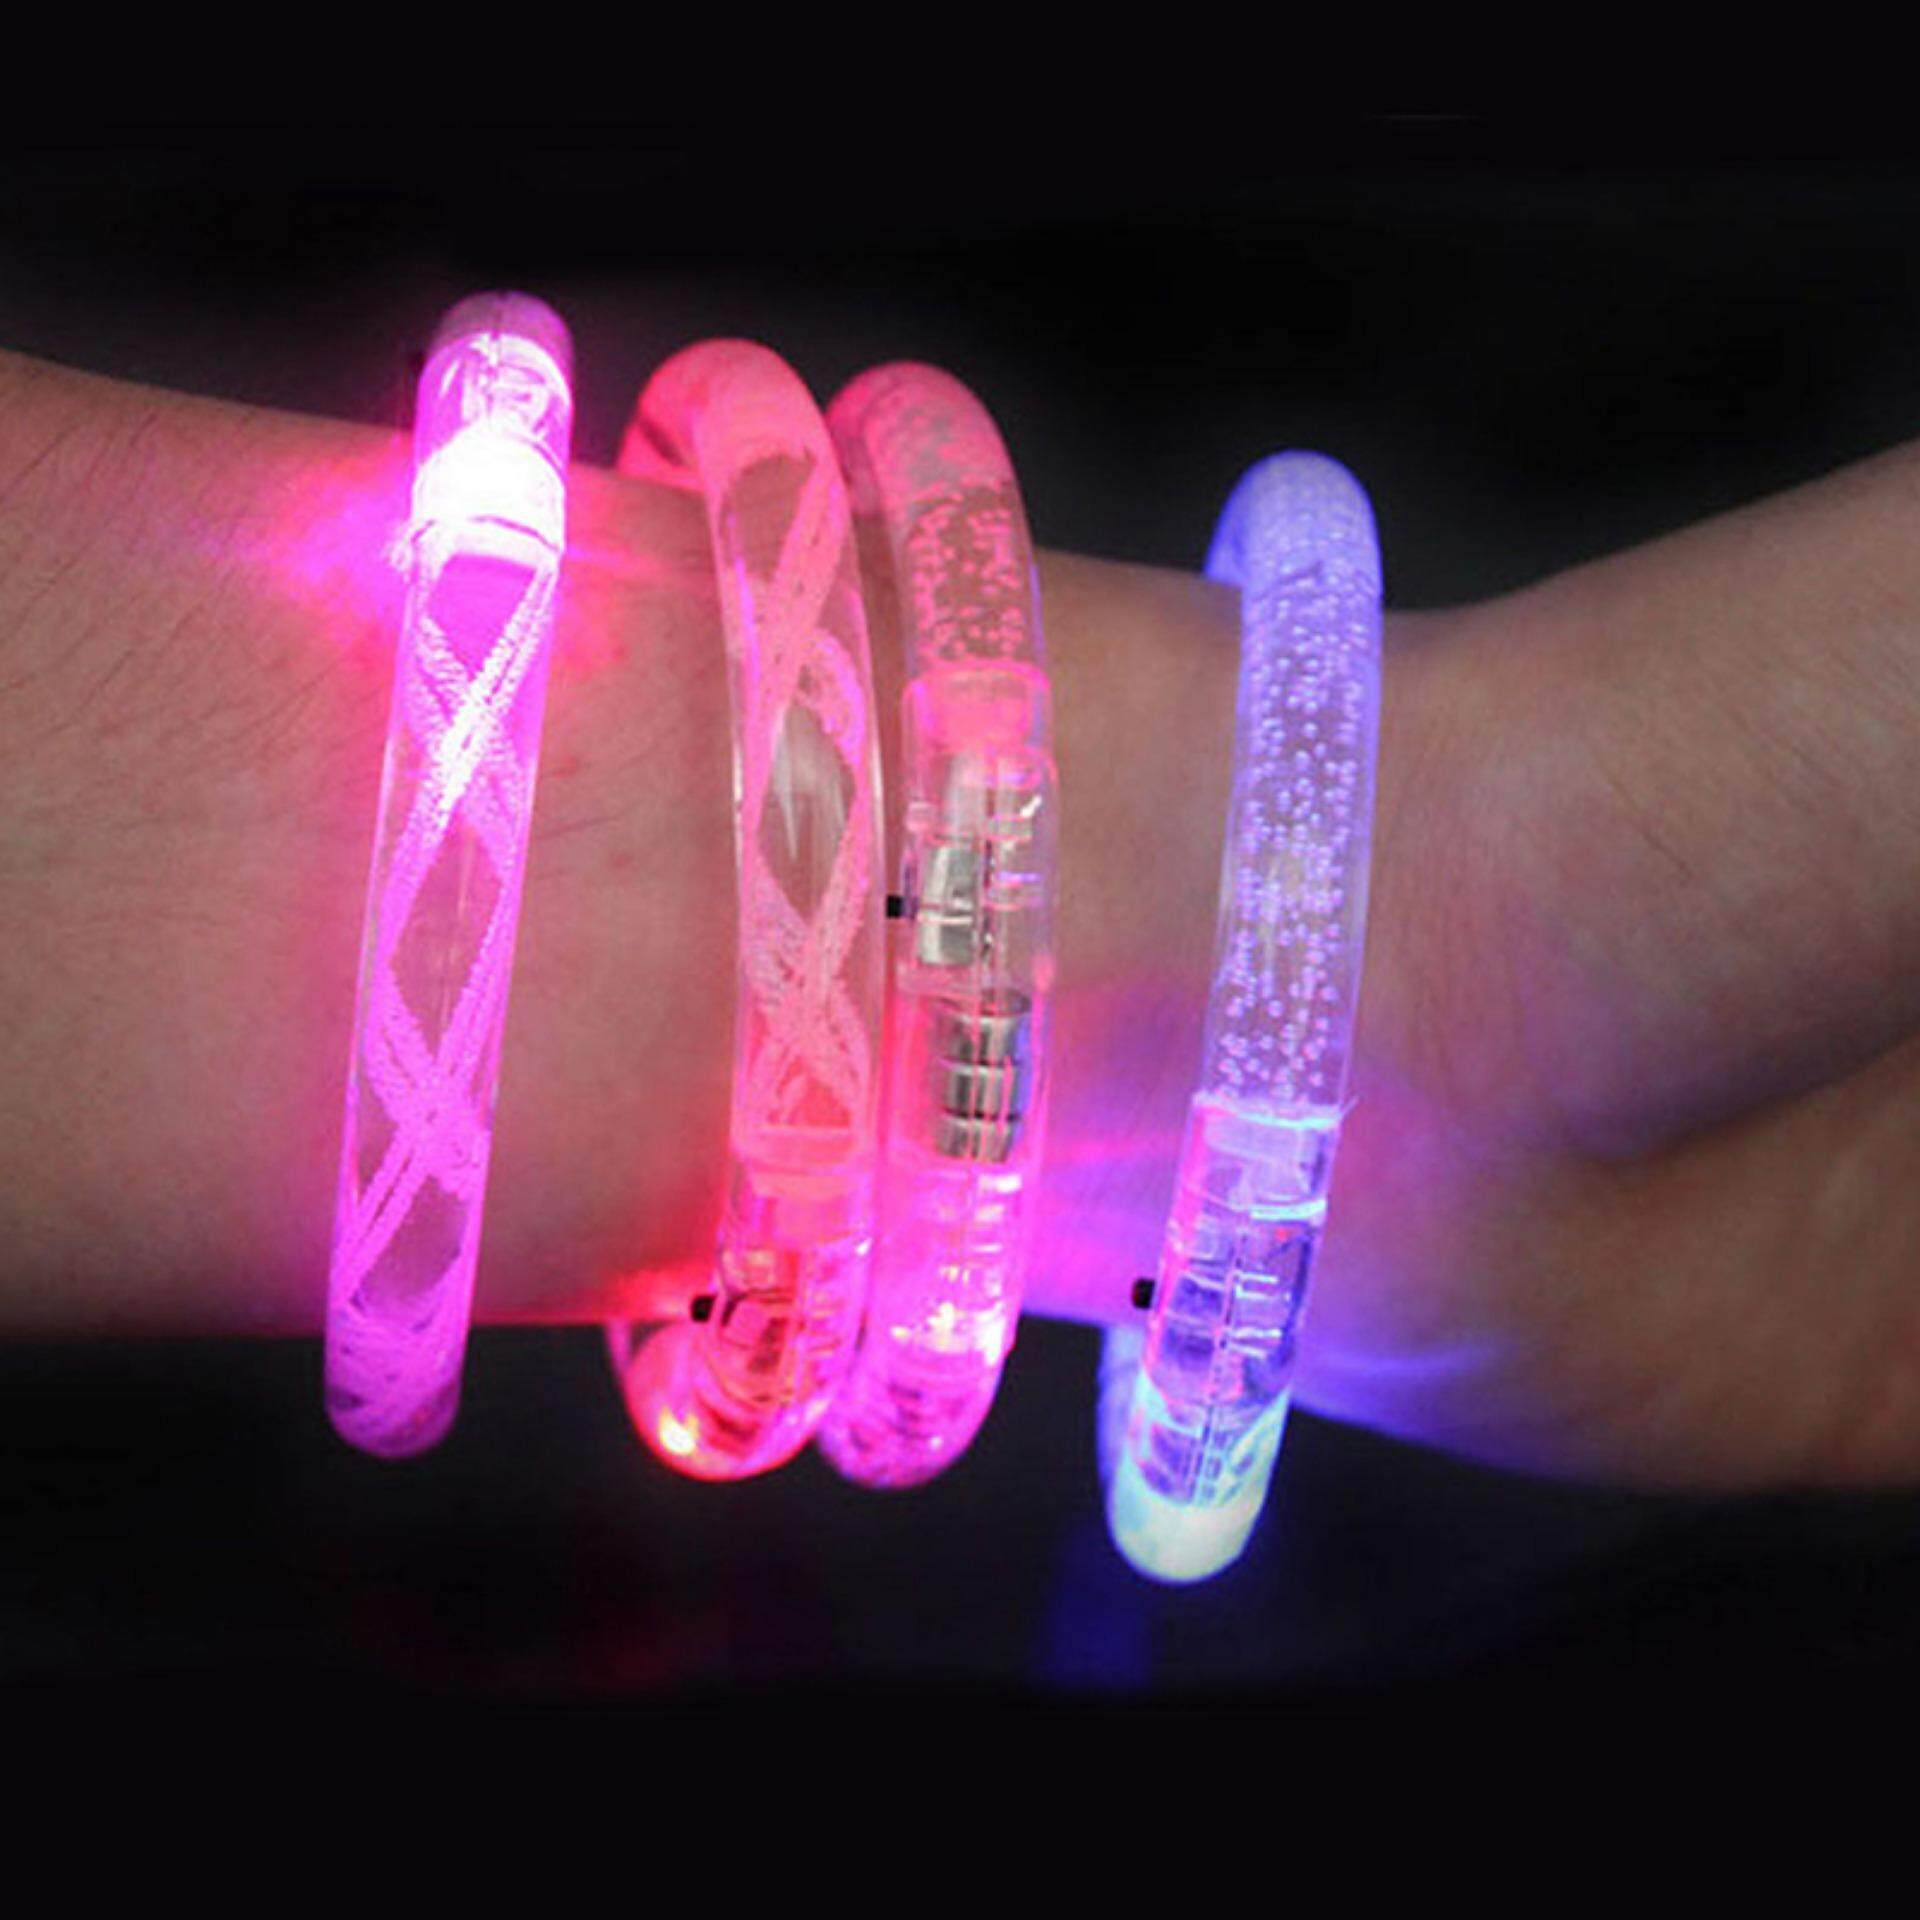 Unisex Tombol Dikendalikan Suara Led Gelang Menyala Diaktifkan Cahaya Flash Bangle By Civilian Princess.